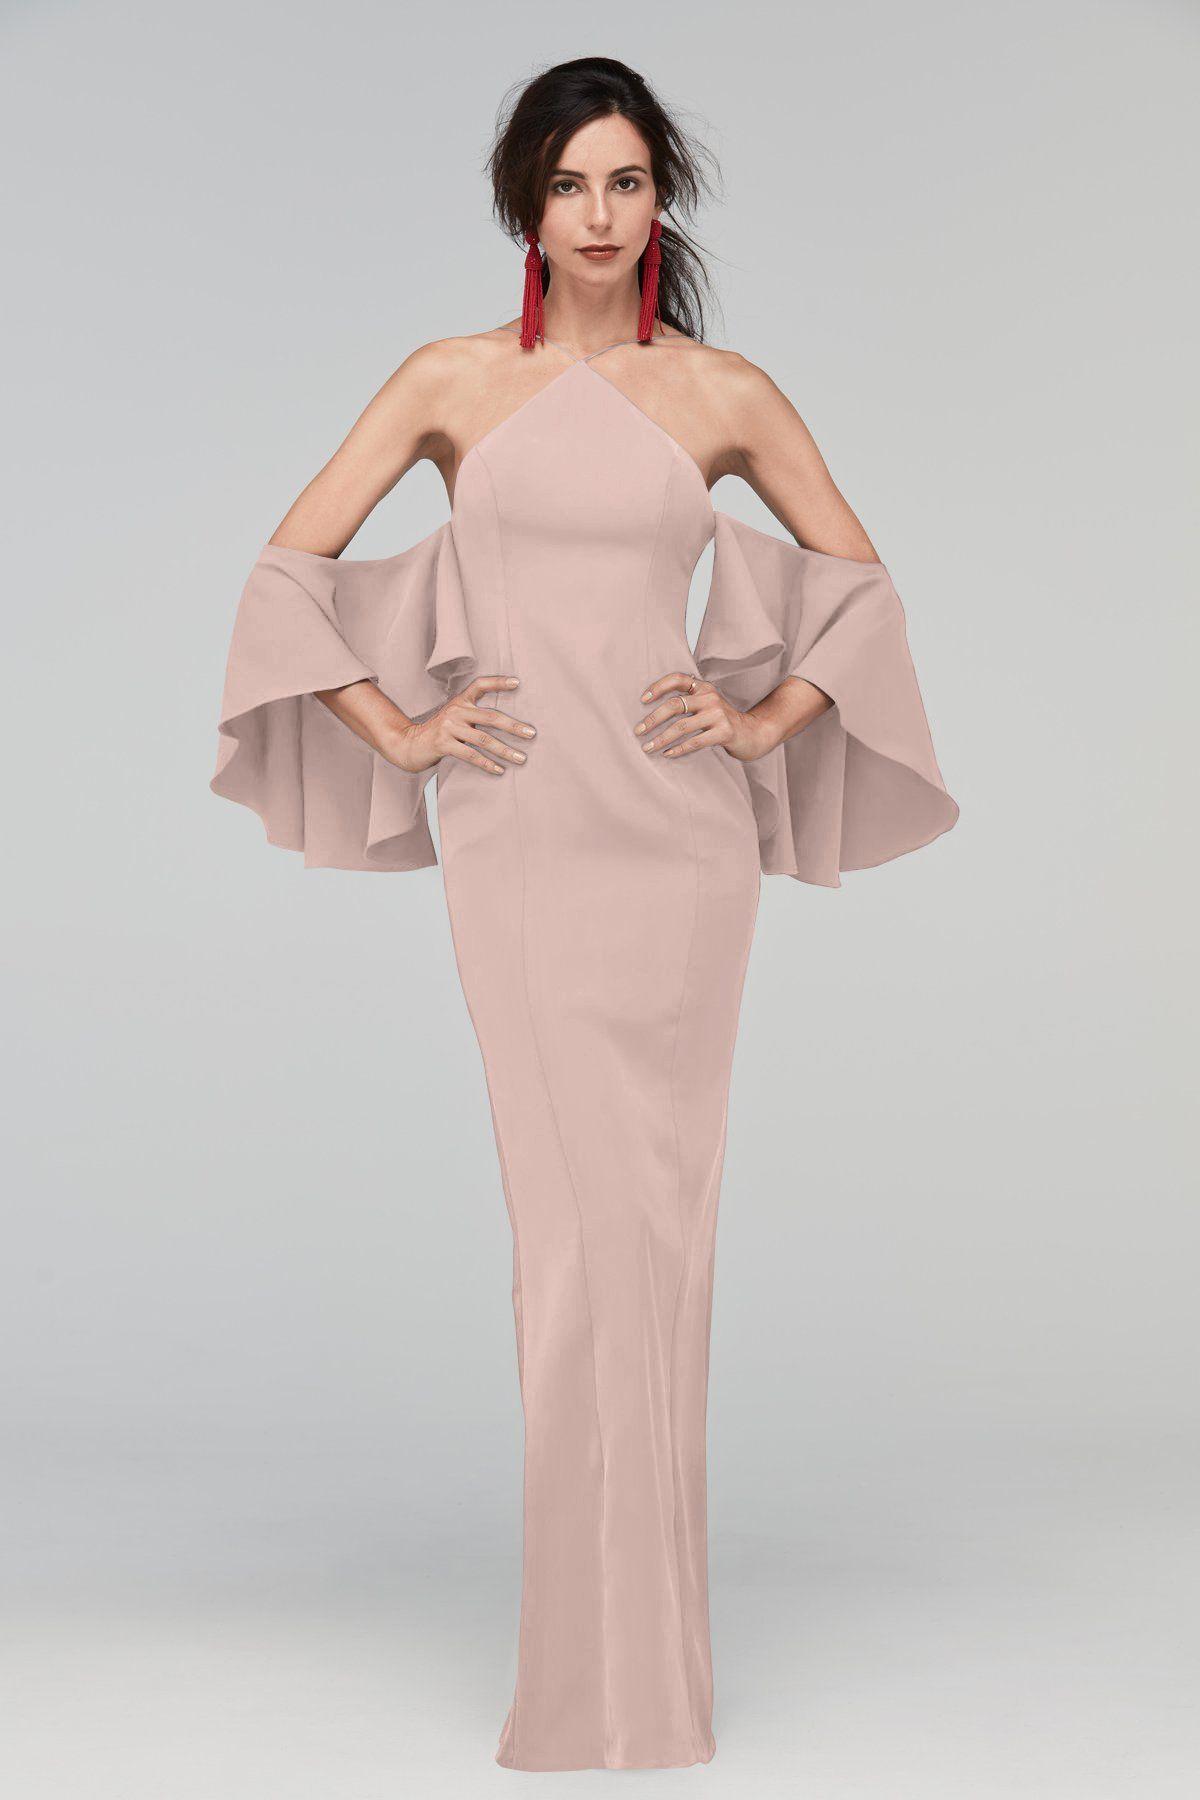 Raquel | jupes et robes mondiale | Pinterest | Vestiditos, Vestidos ...